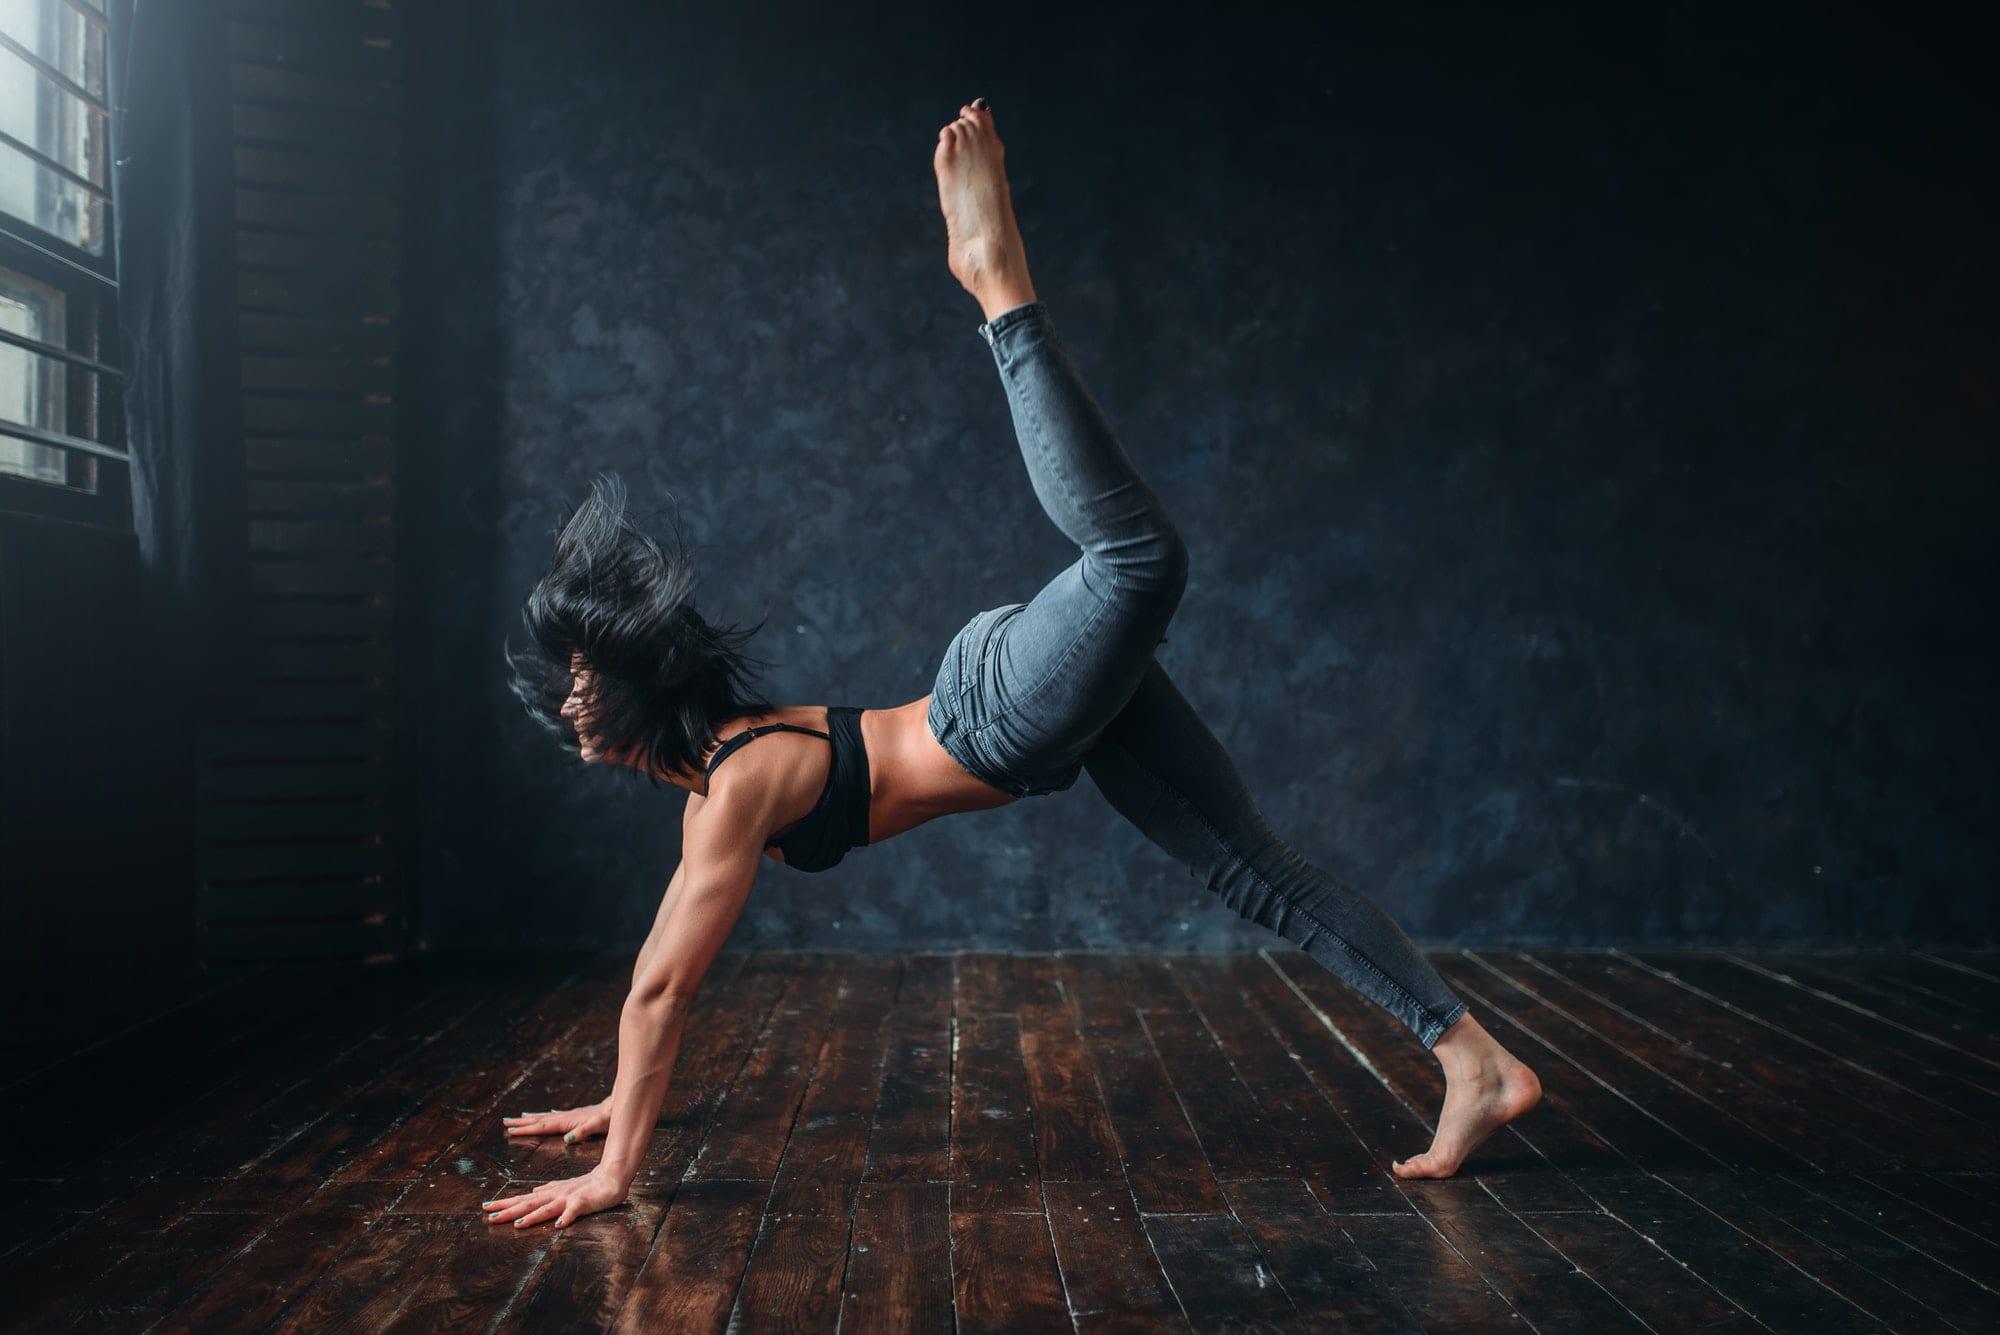 Contemporary dance, female dancer, contemp dancing